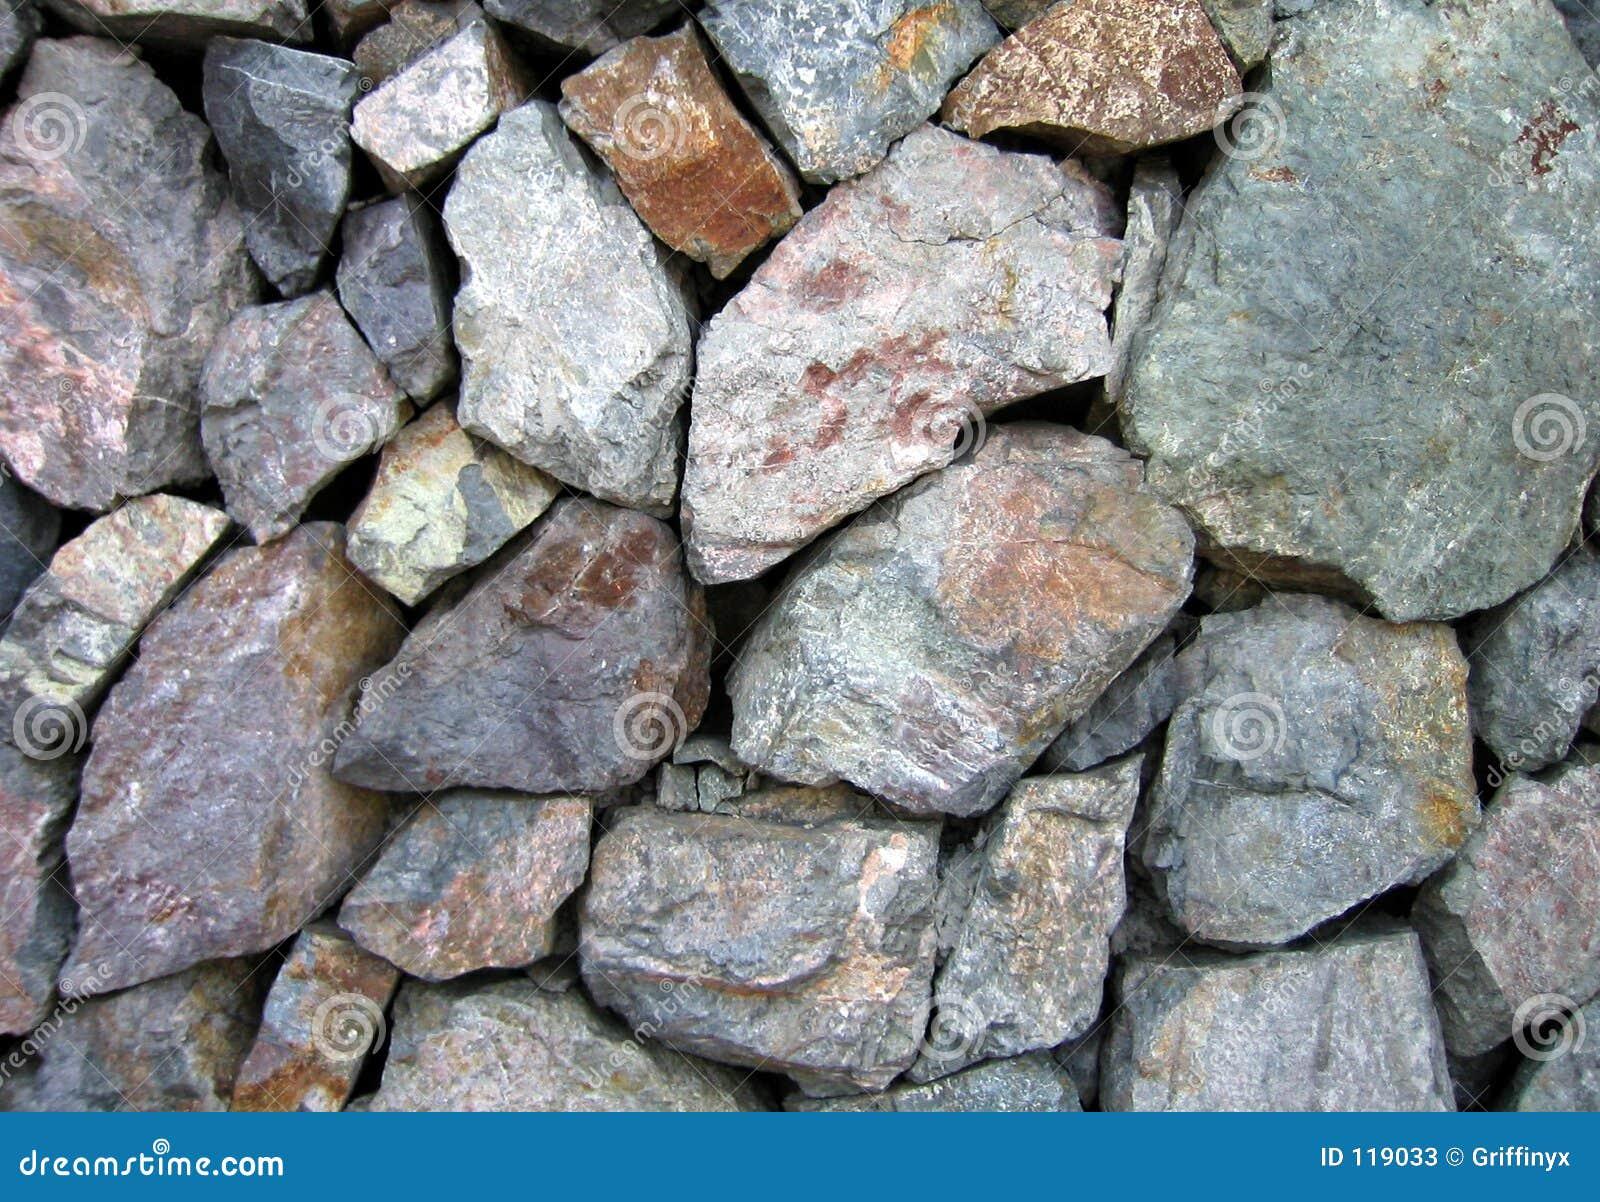 Rocks Assortment